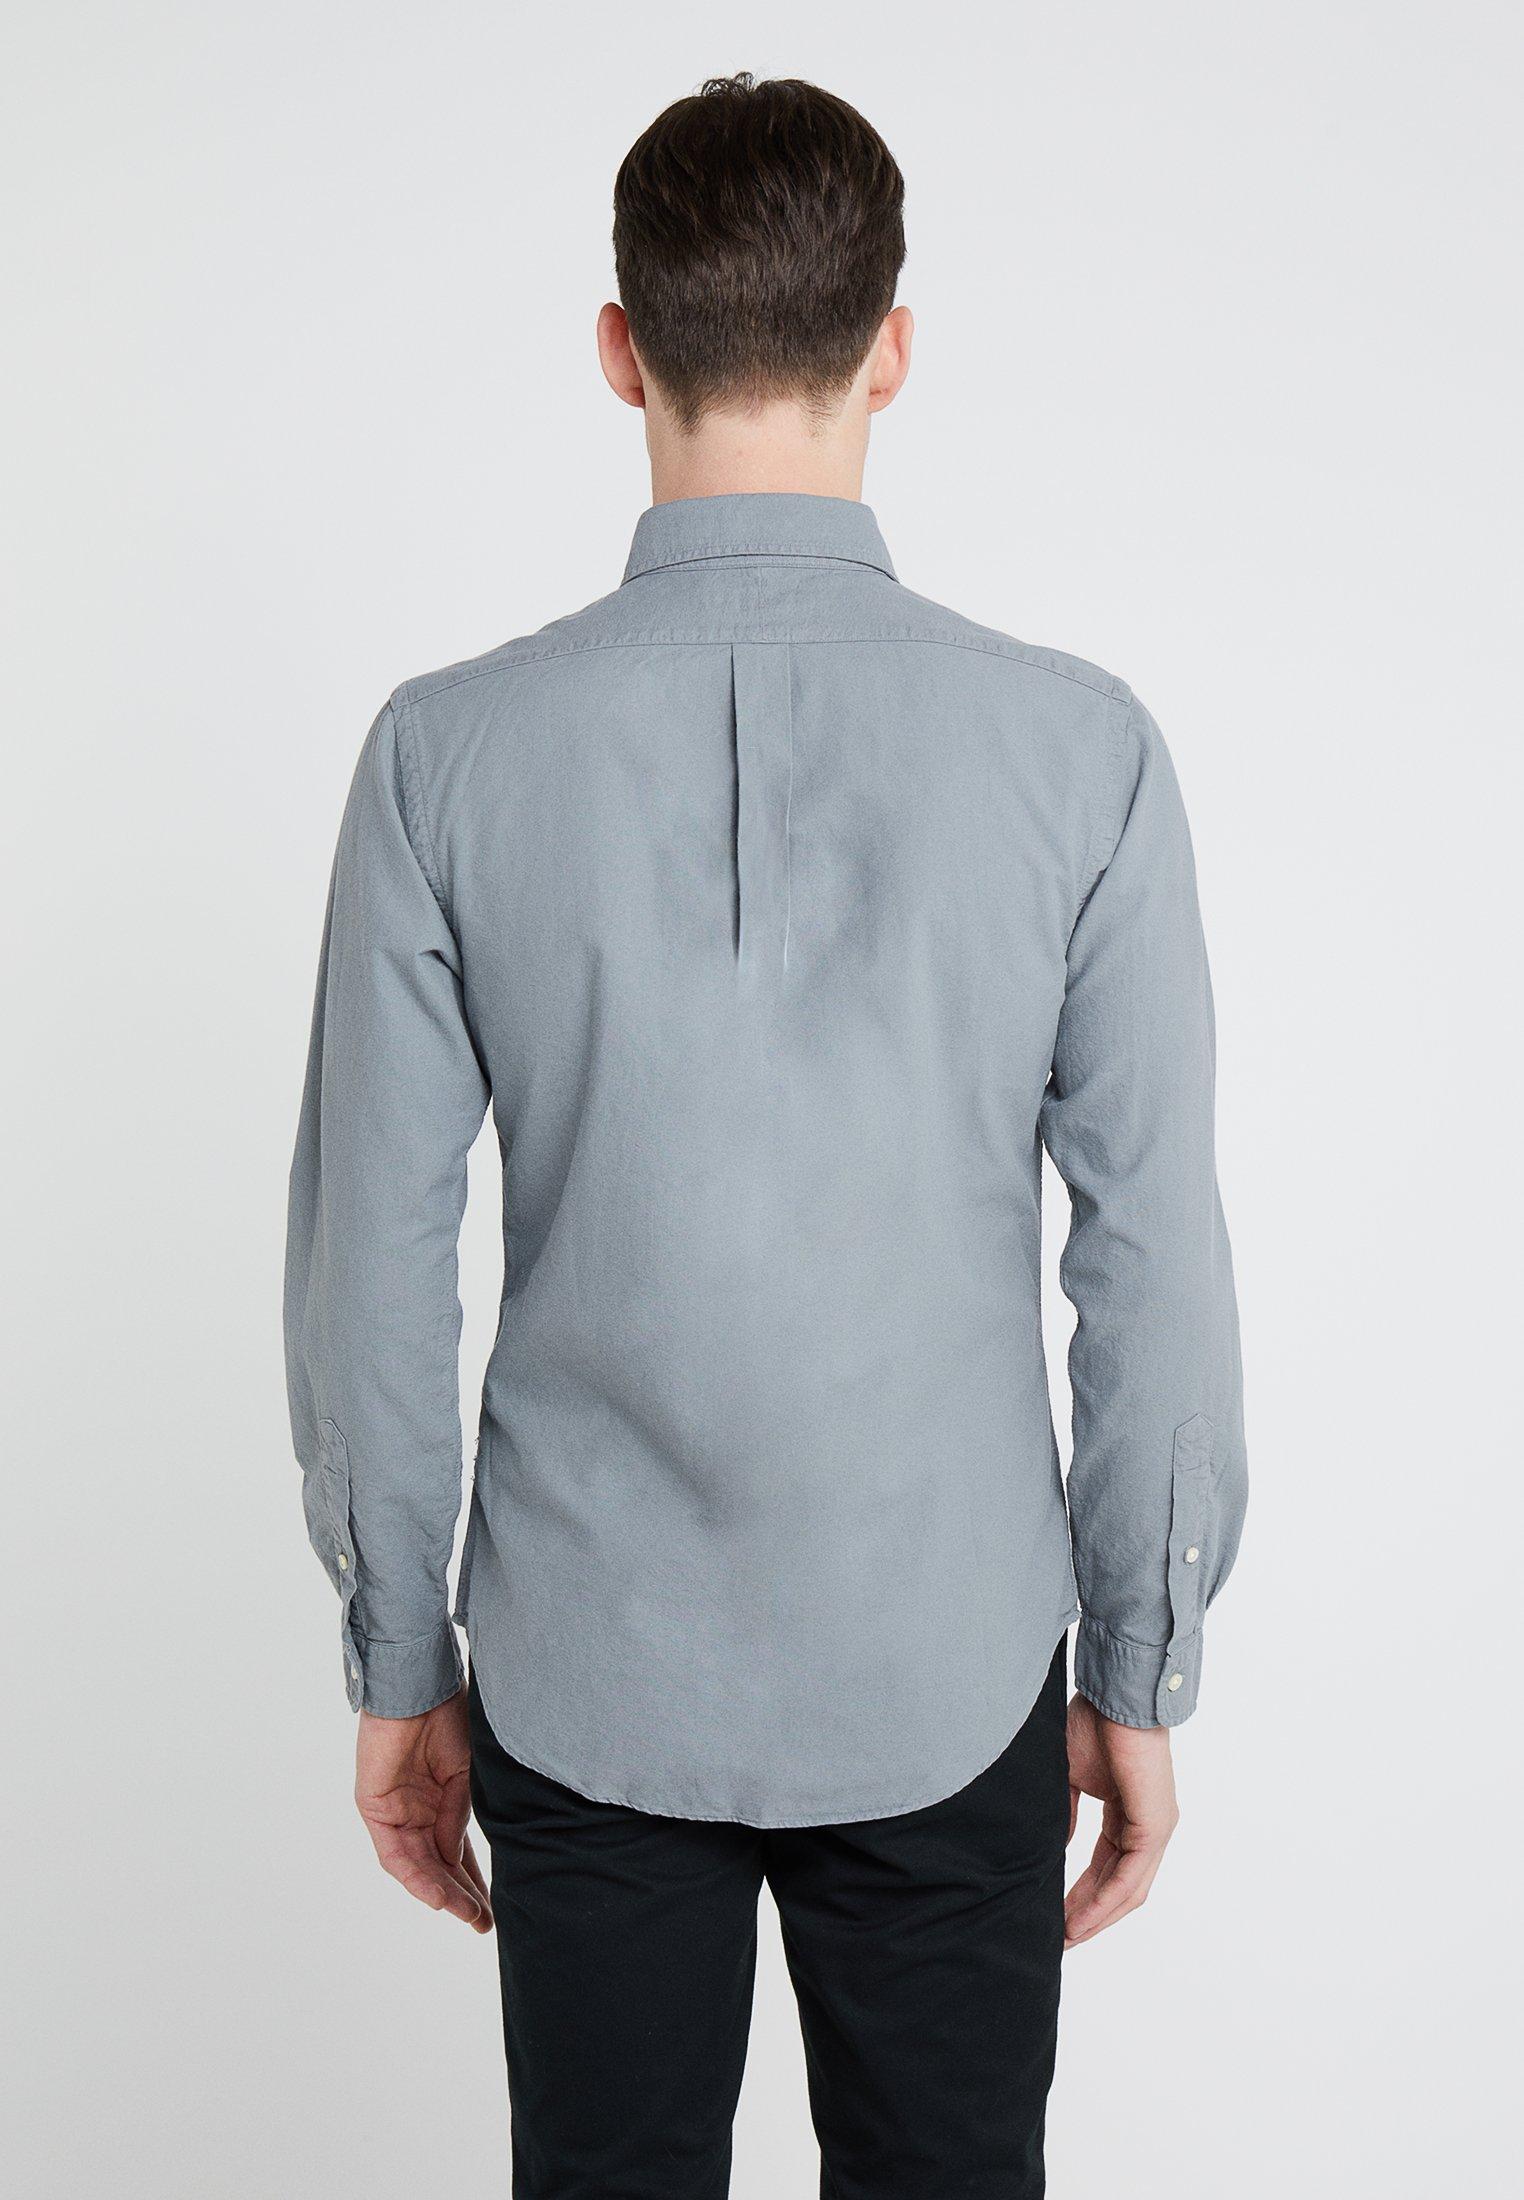 Perfect Ralph Oxford Grey Slim Polo Lauren FitChemise 76gyvYbfmI